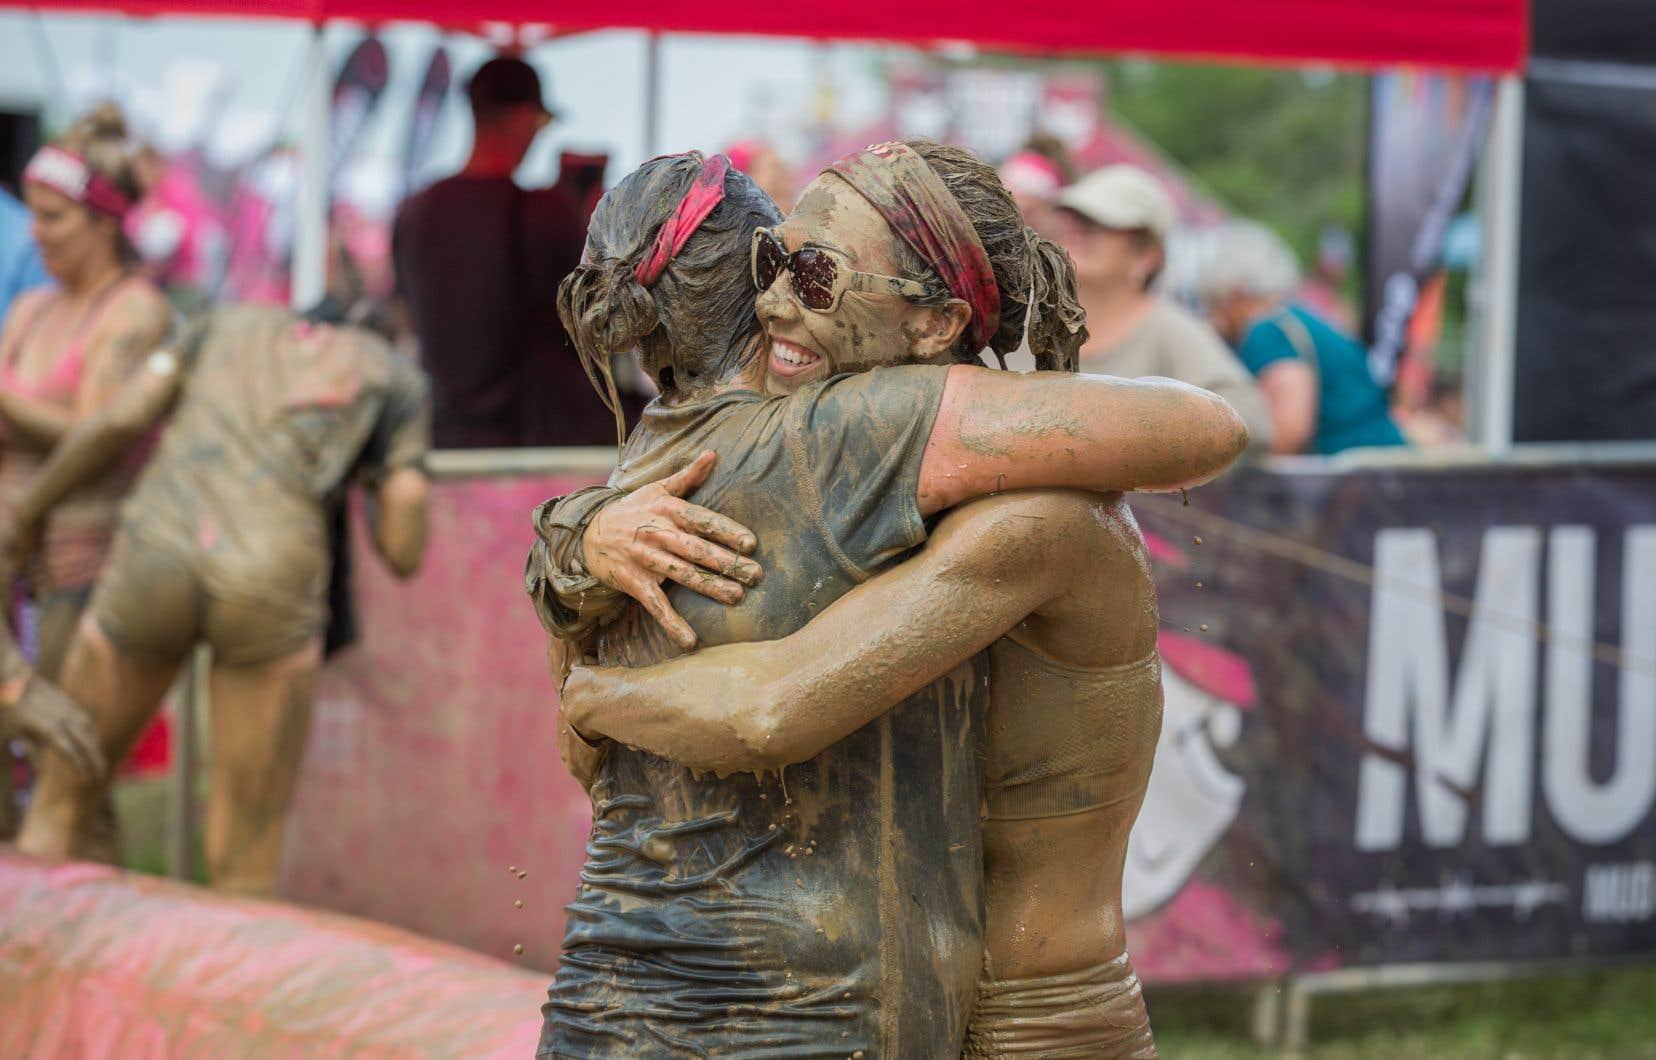 Deux femmes se faisaient l'accolade lors de la Mud Girl Run d'Hamilton, en Ontario, l'an dernier.